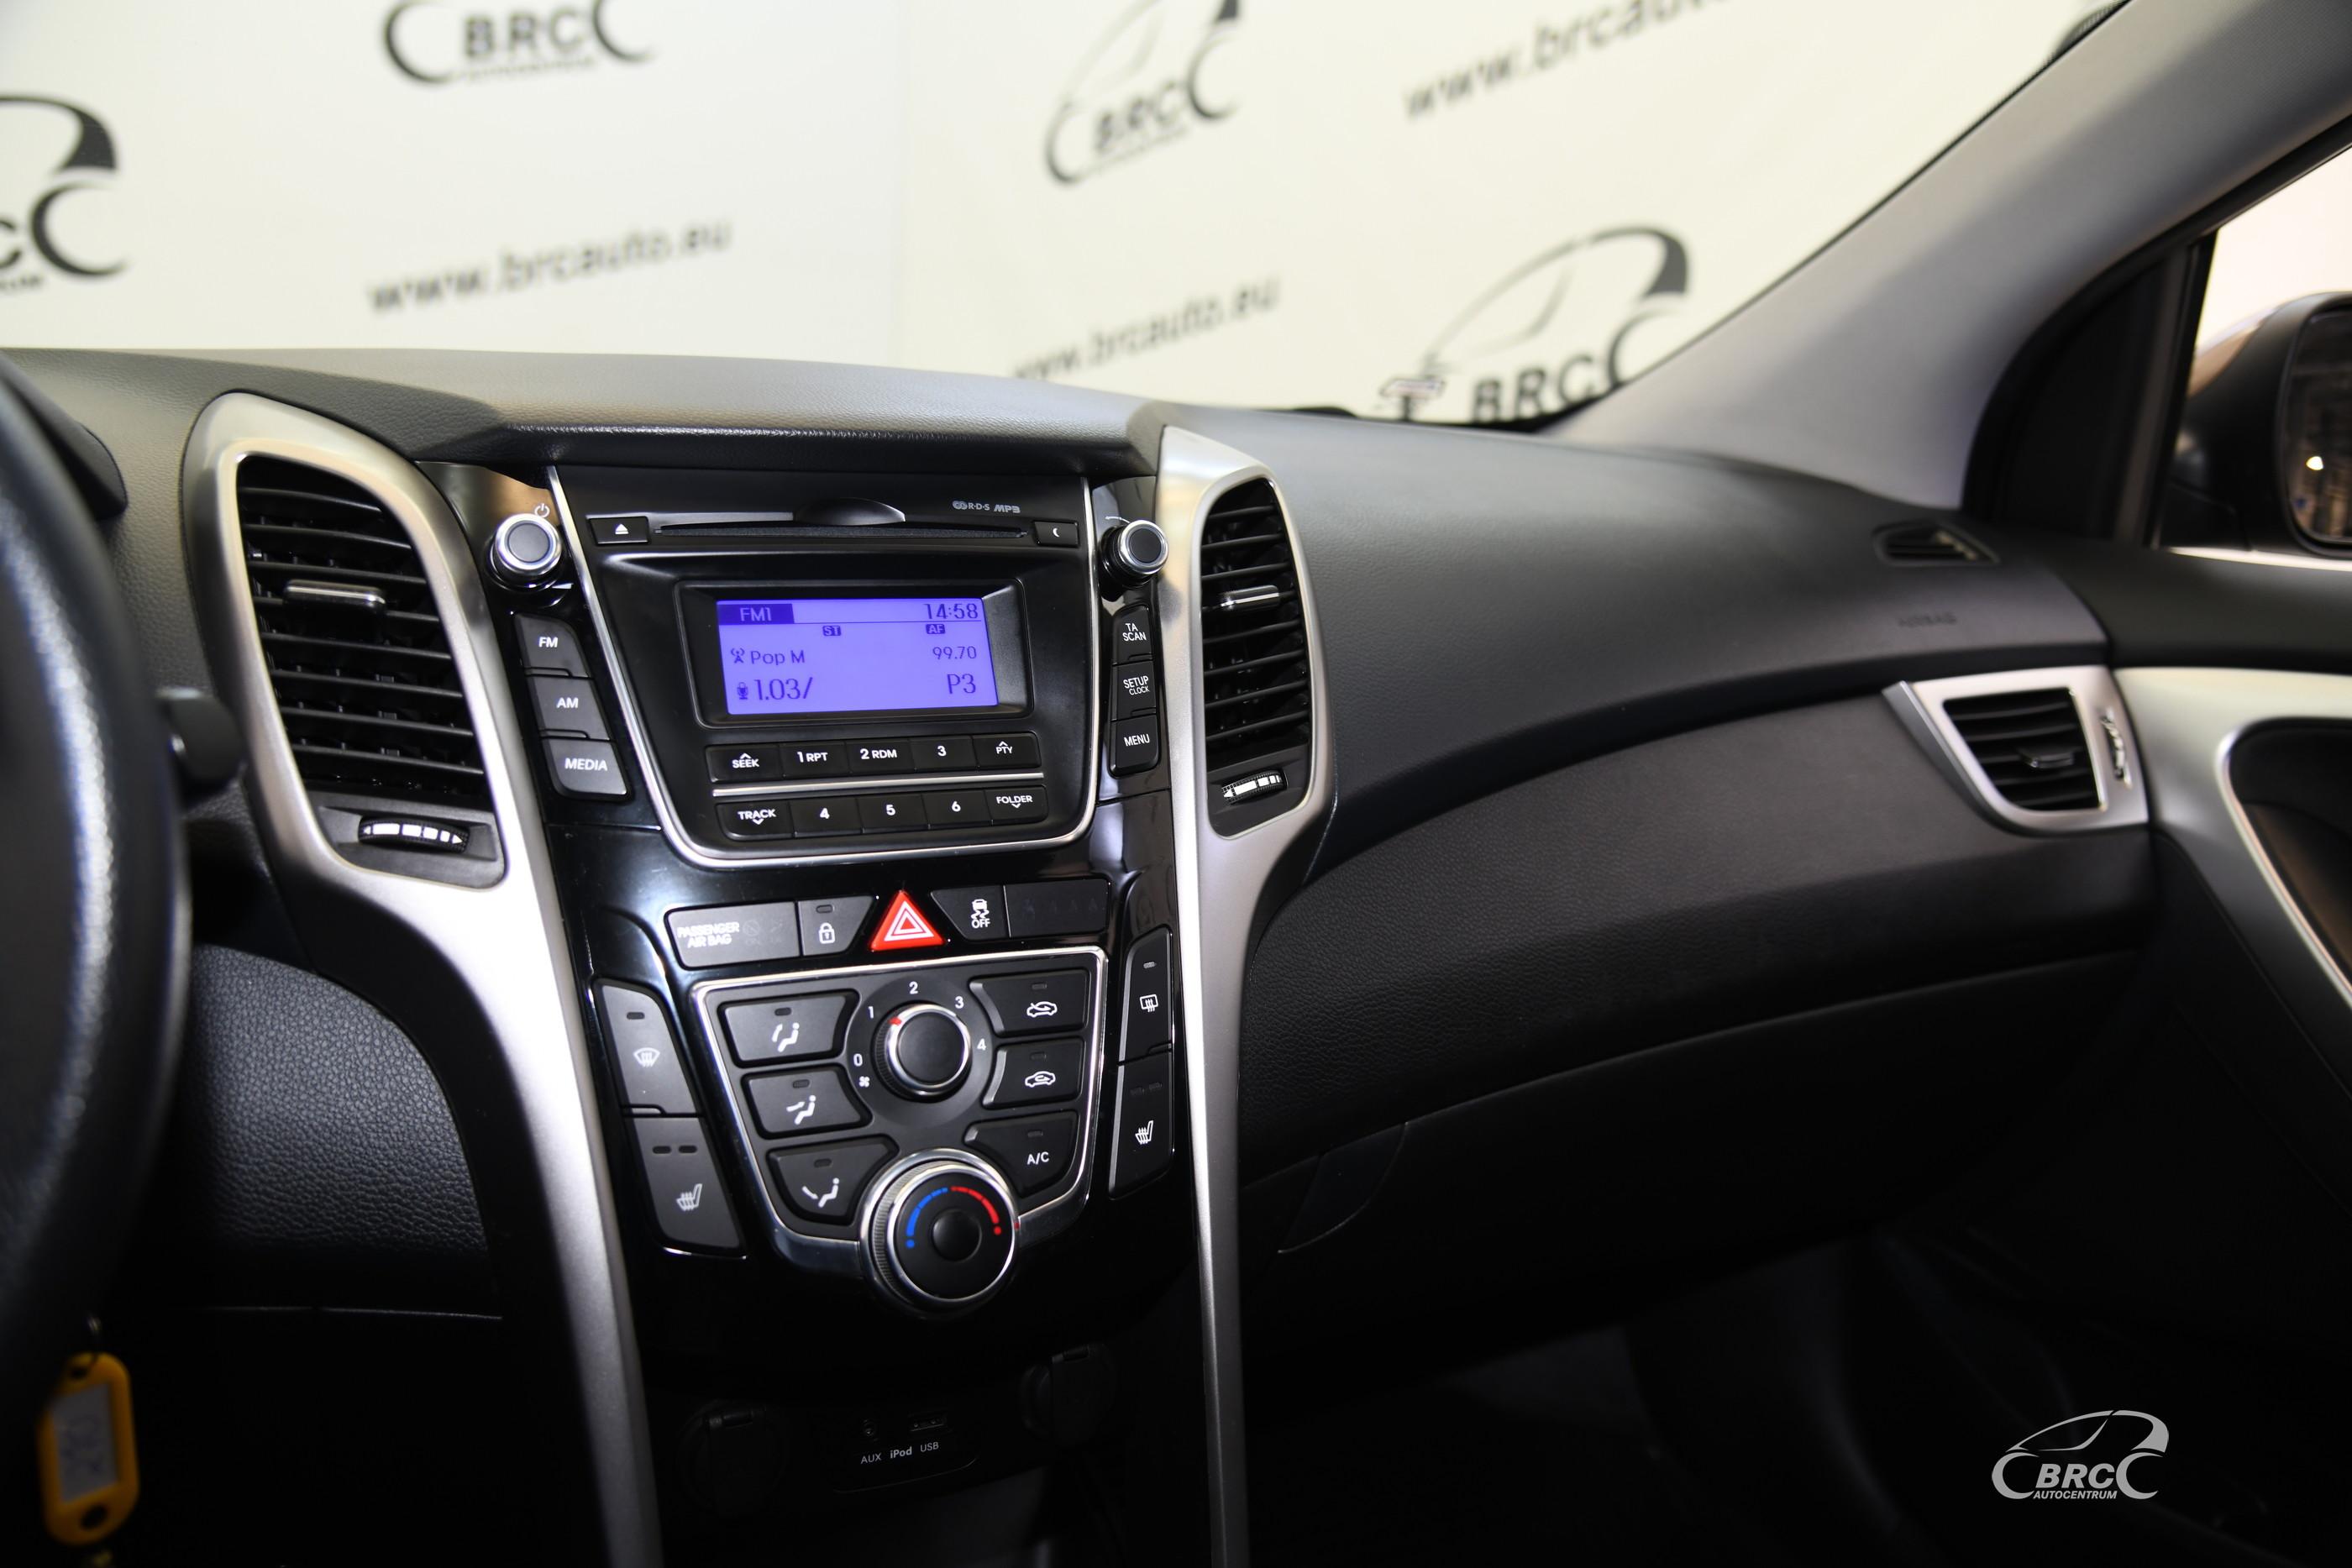 Hyundai i30 1.4 CRDi BlueDrive Tourer